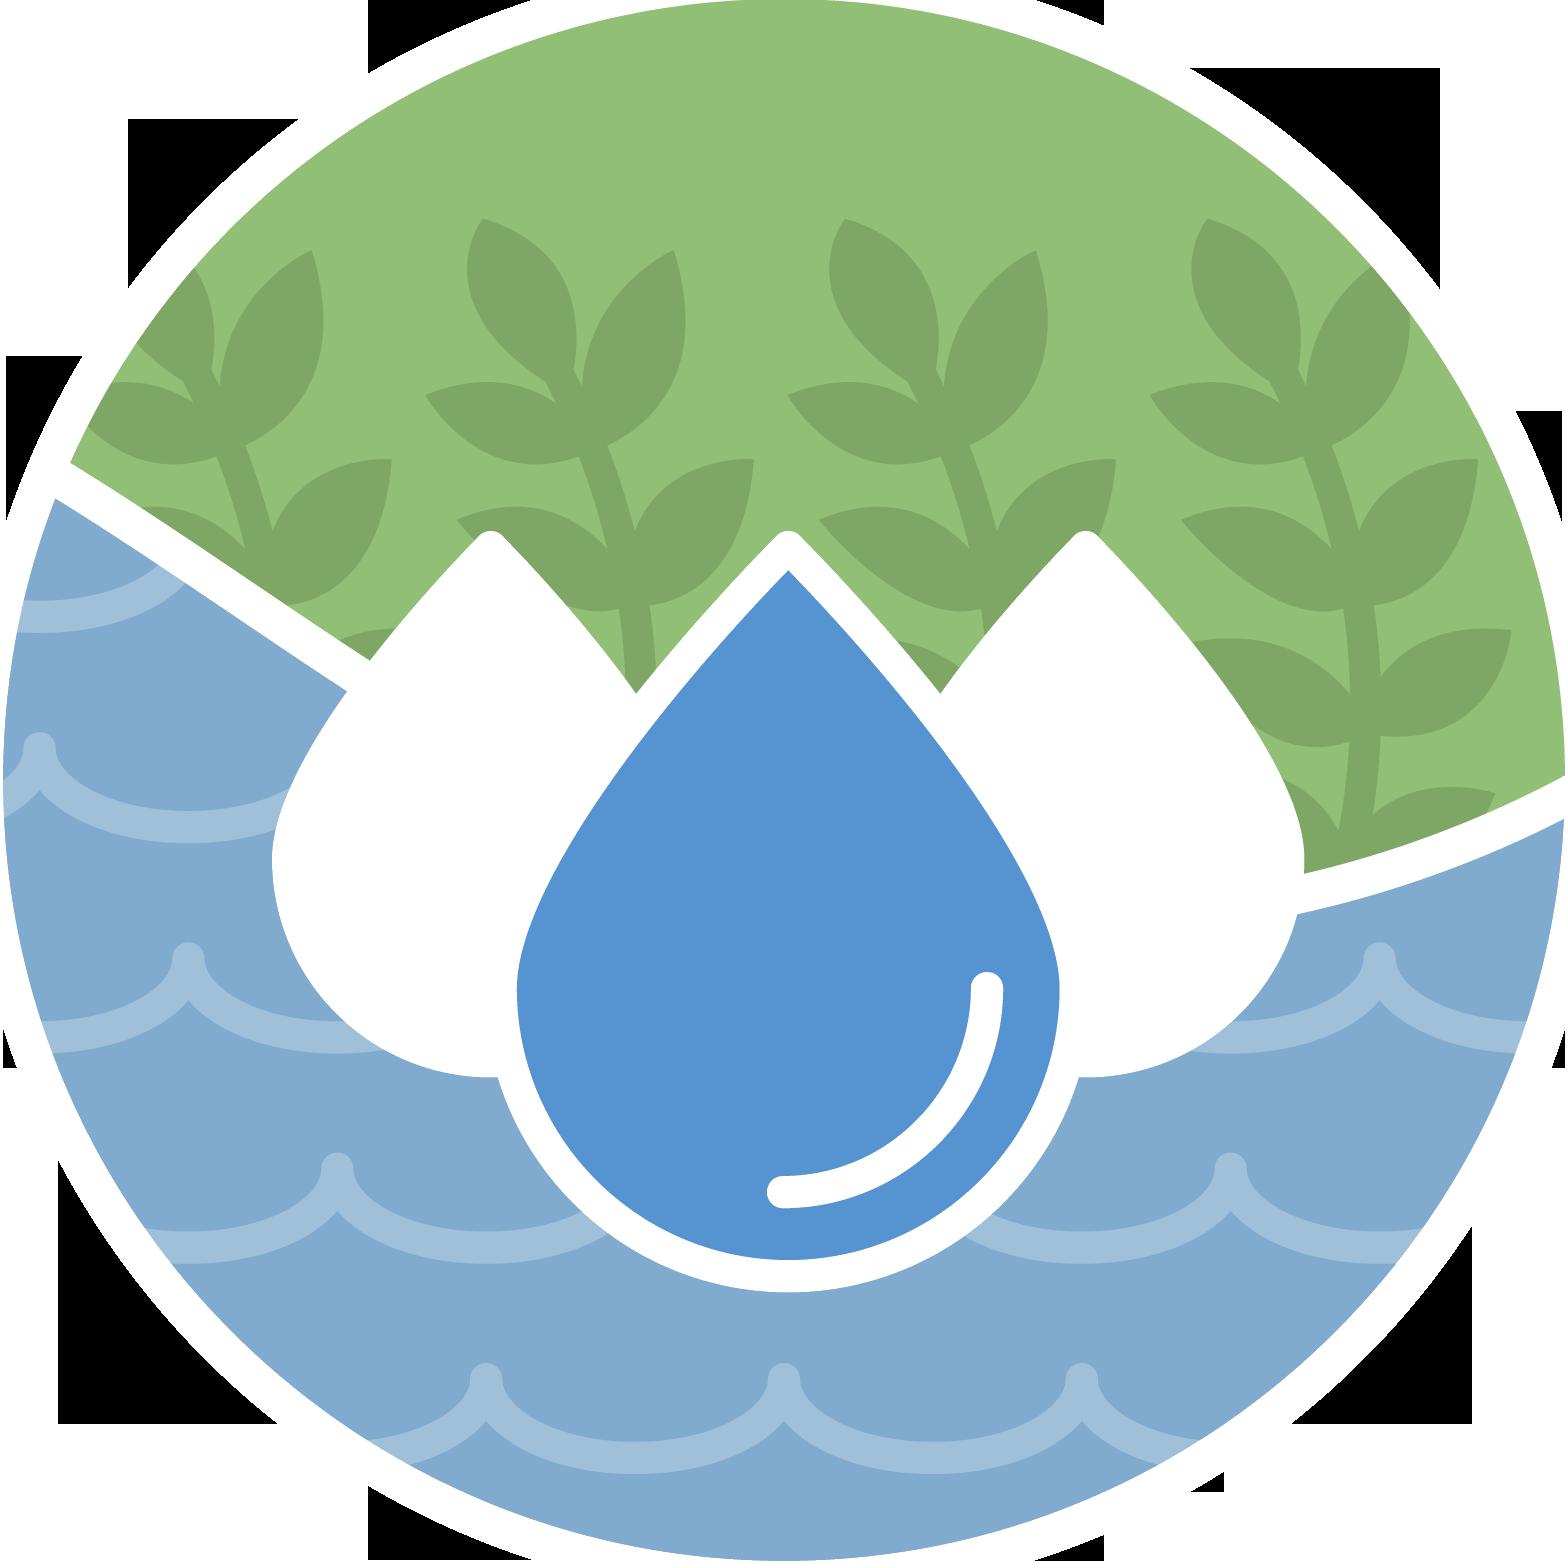 Environment clipart environmental issue, Environment.